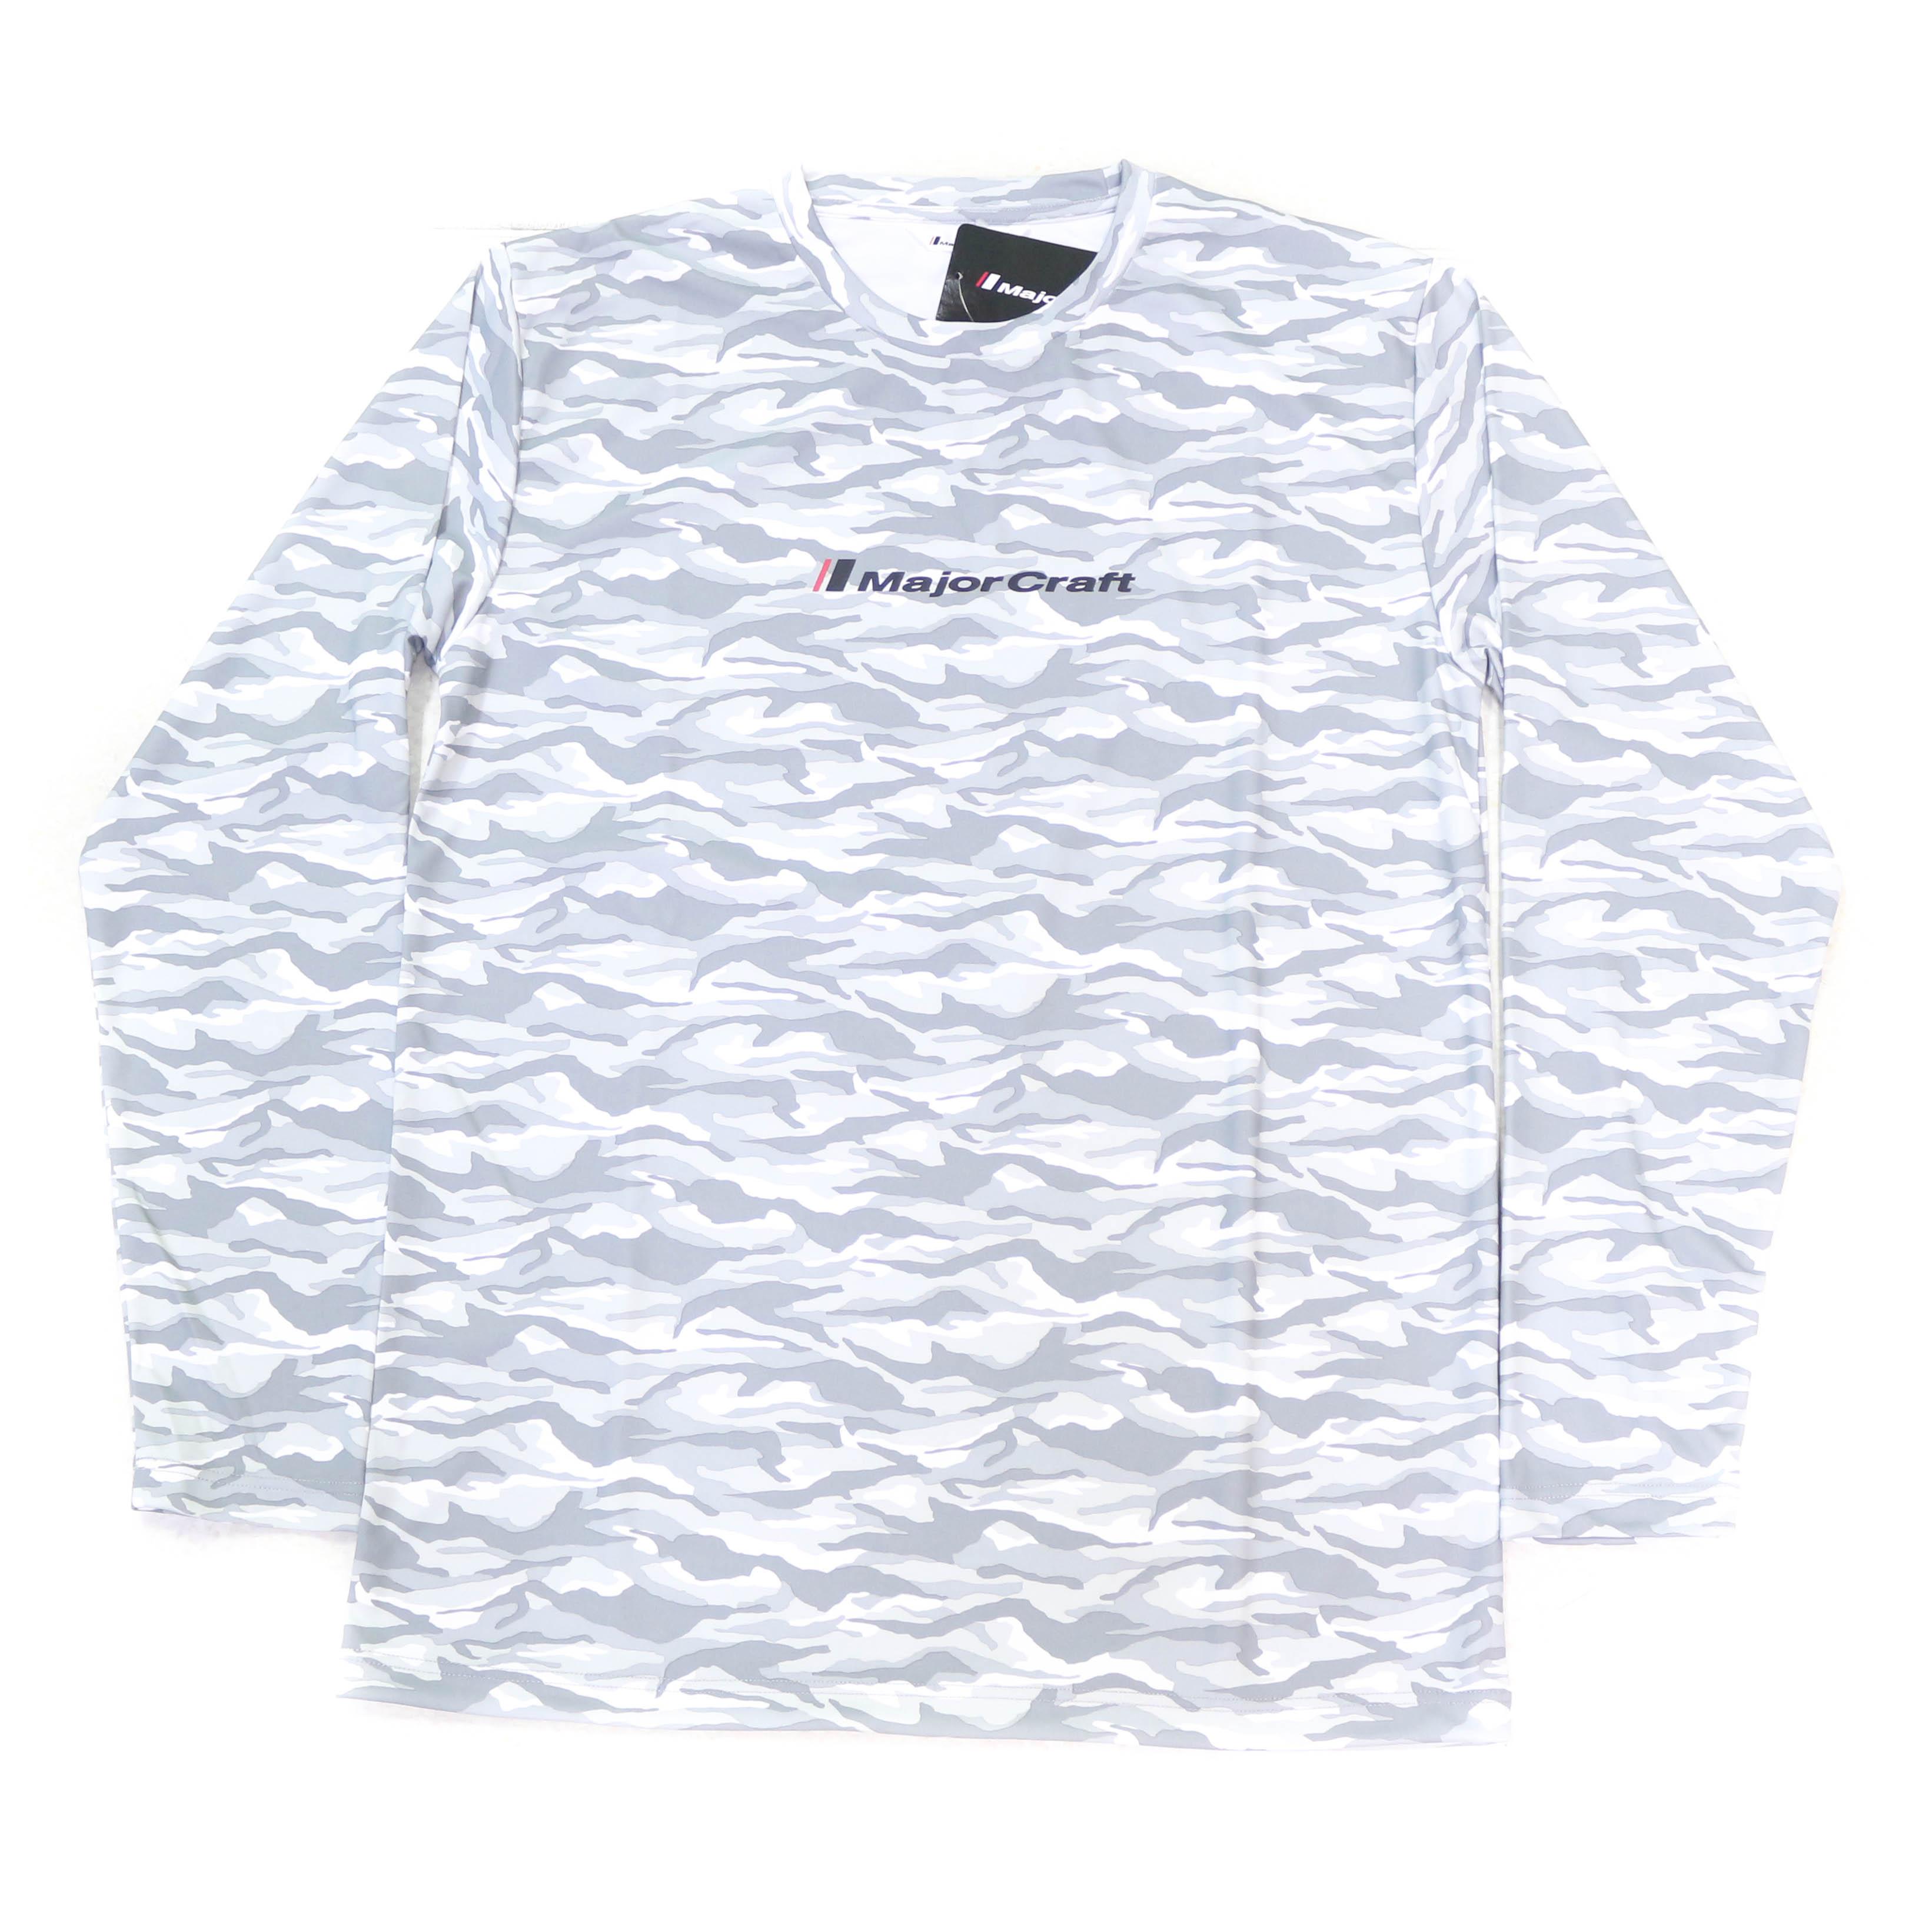 Major Craft T-Shirt Long Sleeve MCW-DLT-4L/GCM (3246)